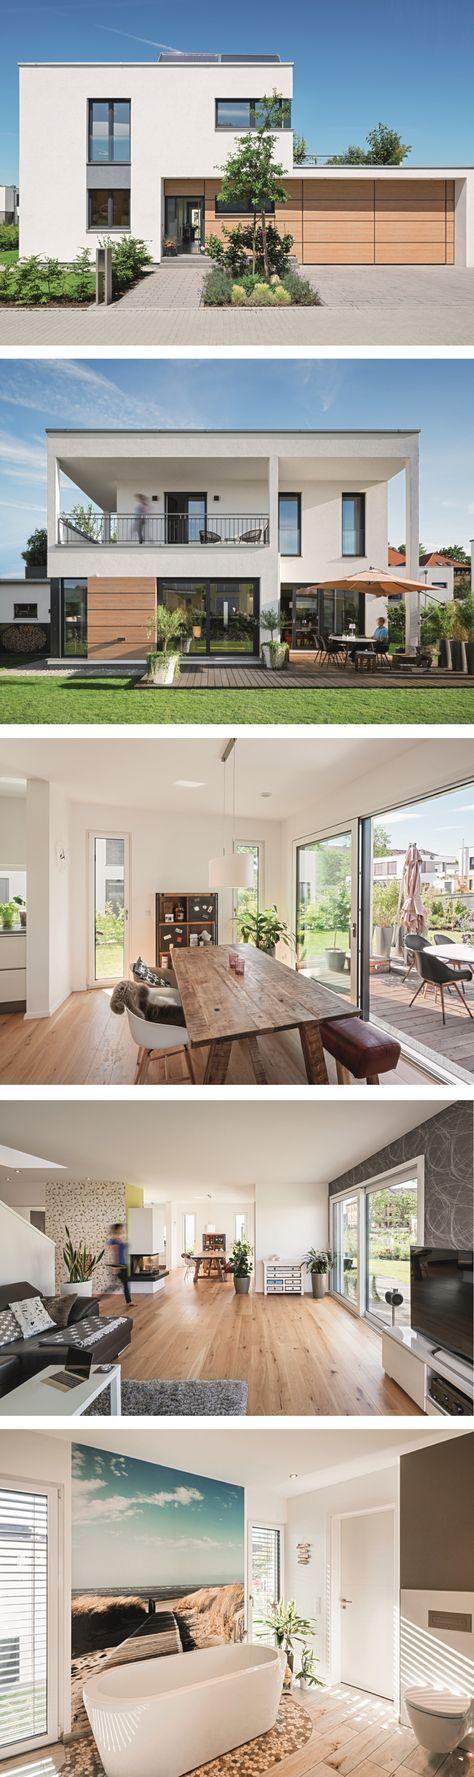 Moderne Flachdach-Stadtvilla im Bauhausstil – Haus…